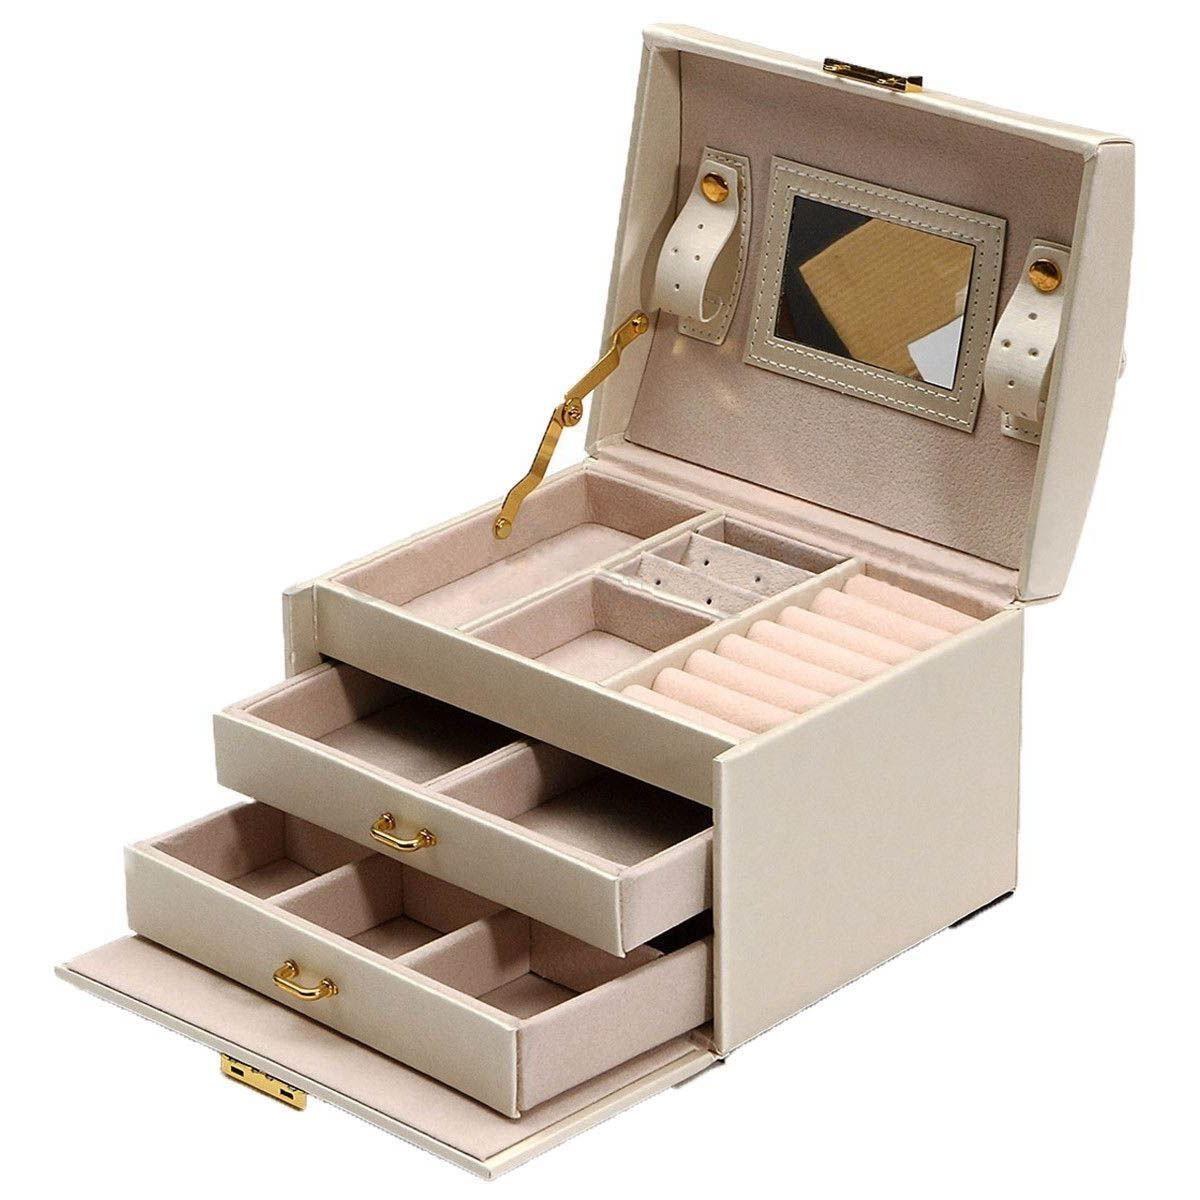 Grand Bijoux Packaging & Display Boîte Armoire Dressing Poitrine avec Fermoirs Bracelet Anneau Organisateur Mallettes